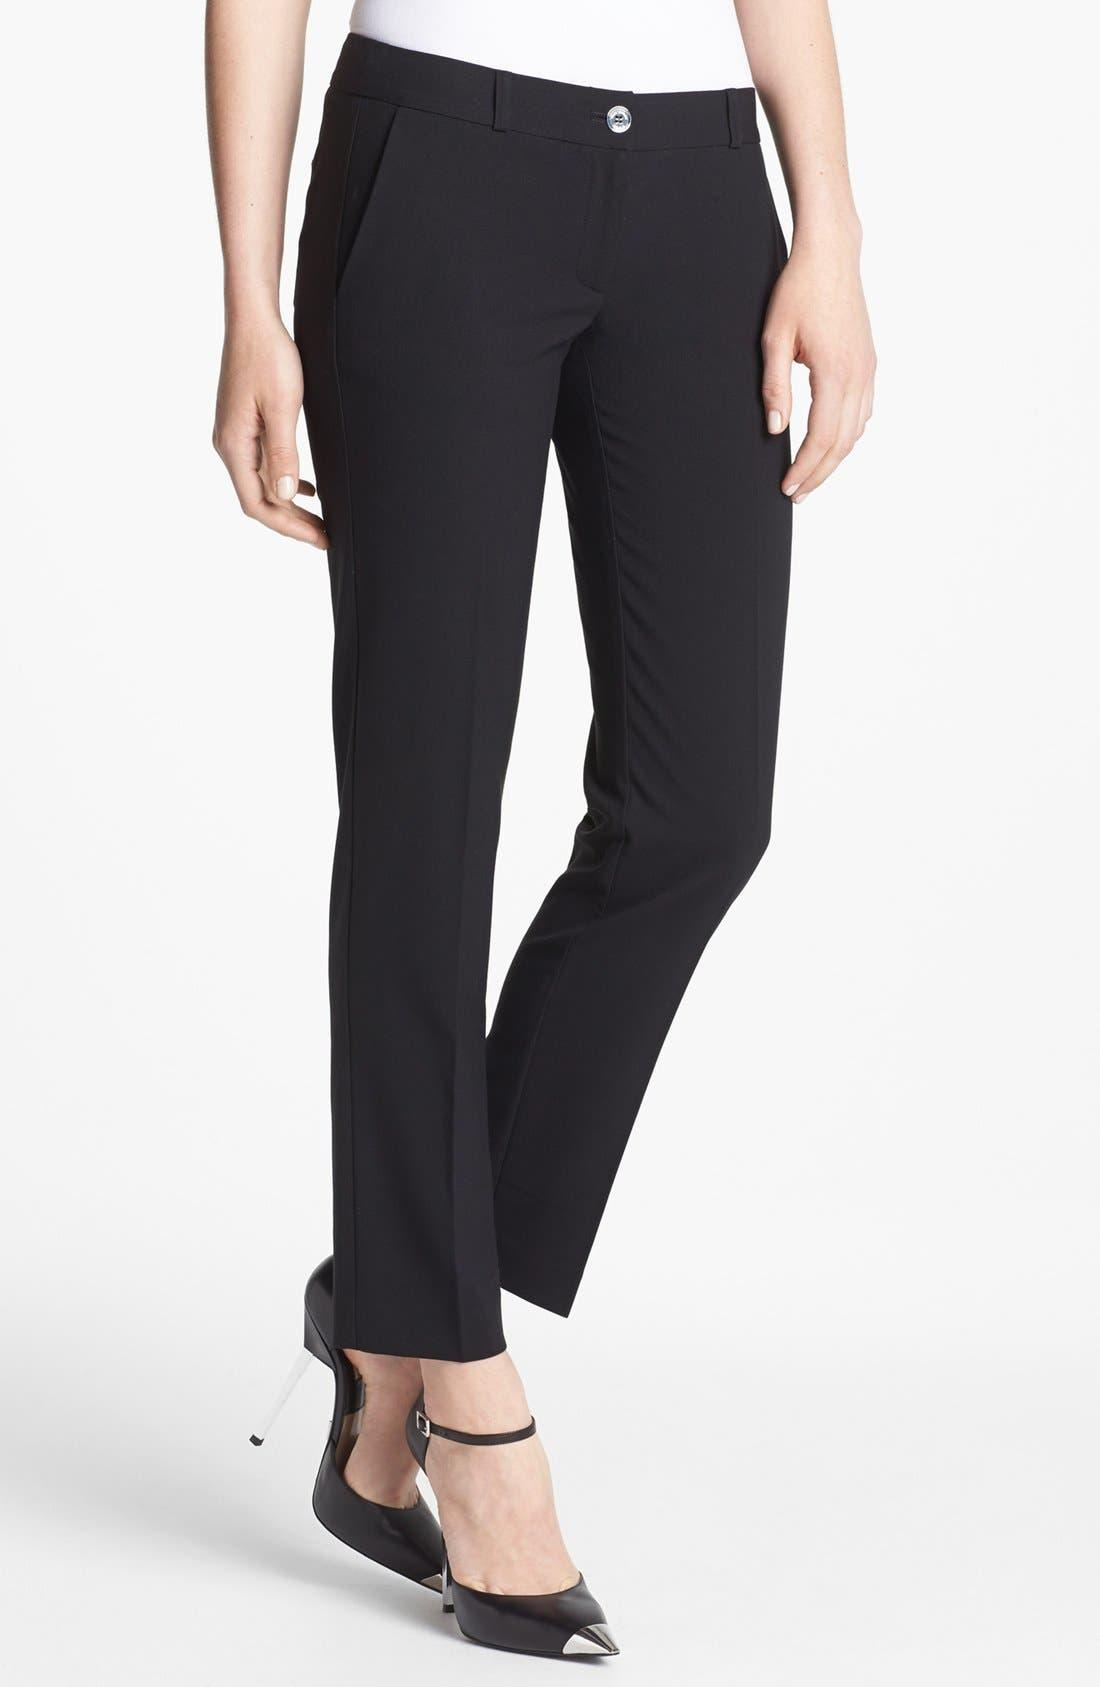 Main Image - MICHAEL Michael Kors 'Miranda' Stretch Ankle Pants (Regular & Petite)